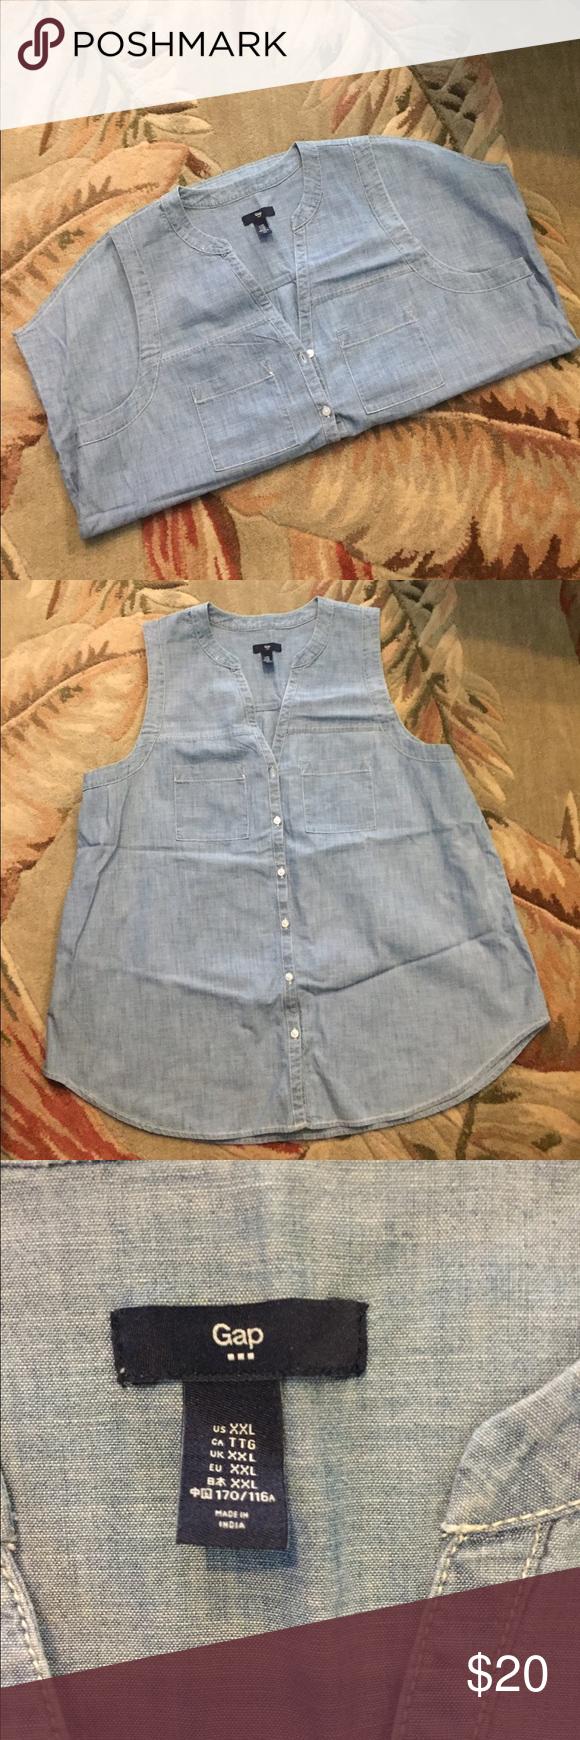 Gap Denim tank shirt GAP denim tank top jeanshirt. NWOT. perfect condition. Never worn. Super cute with white shorts or jean! GAP Tops Tank Tops